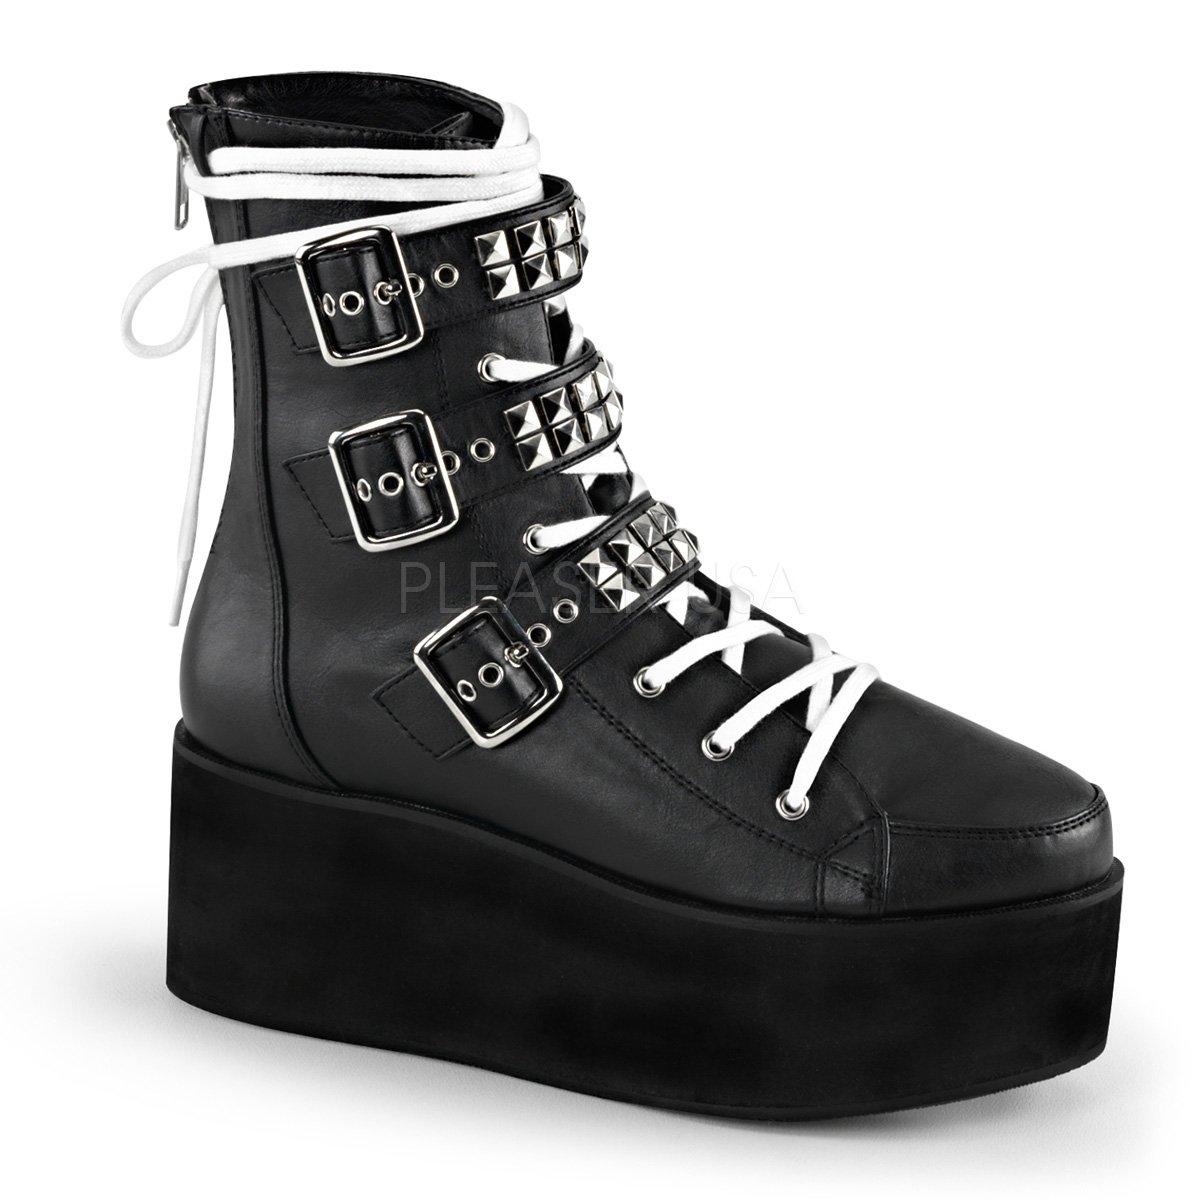 Demonia Women's Grip101/bca Boot B017LL1K5E 10 B(M) US|Black Vegan